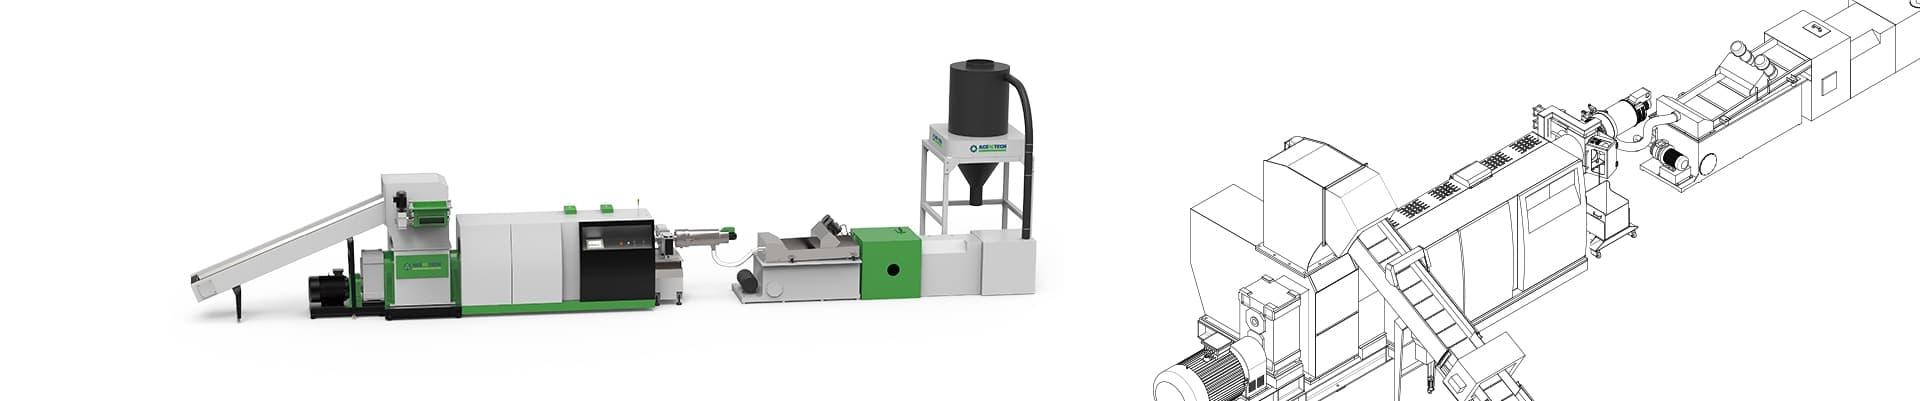 ASP Mini Shredder Extruder Recycling Pelletizing System